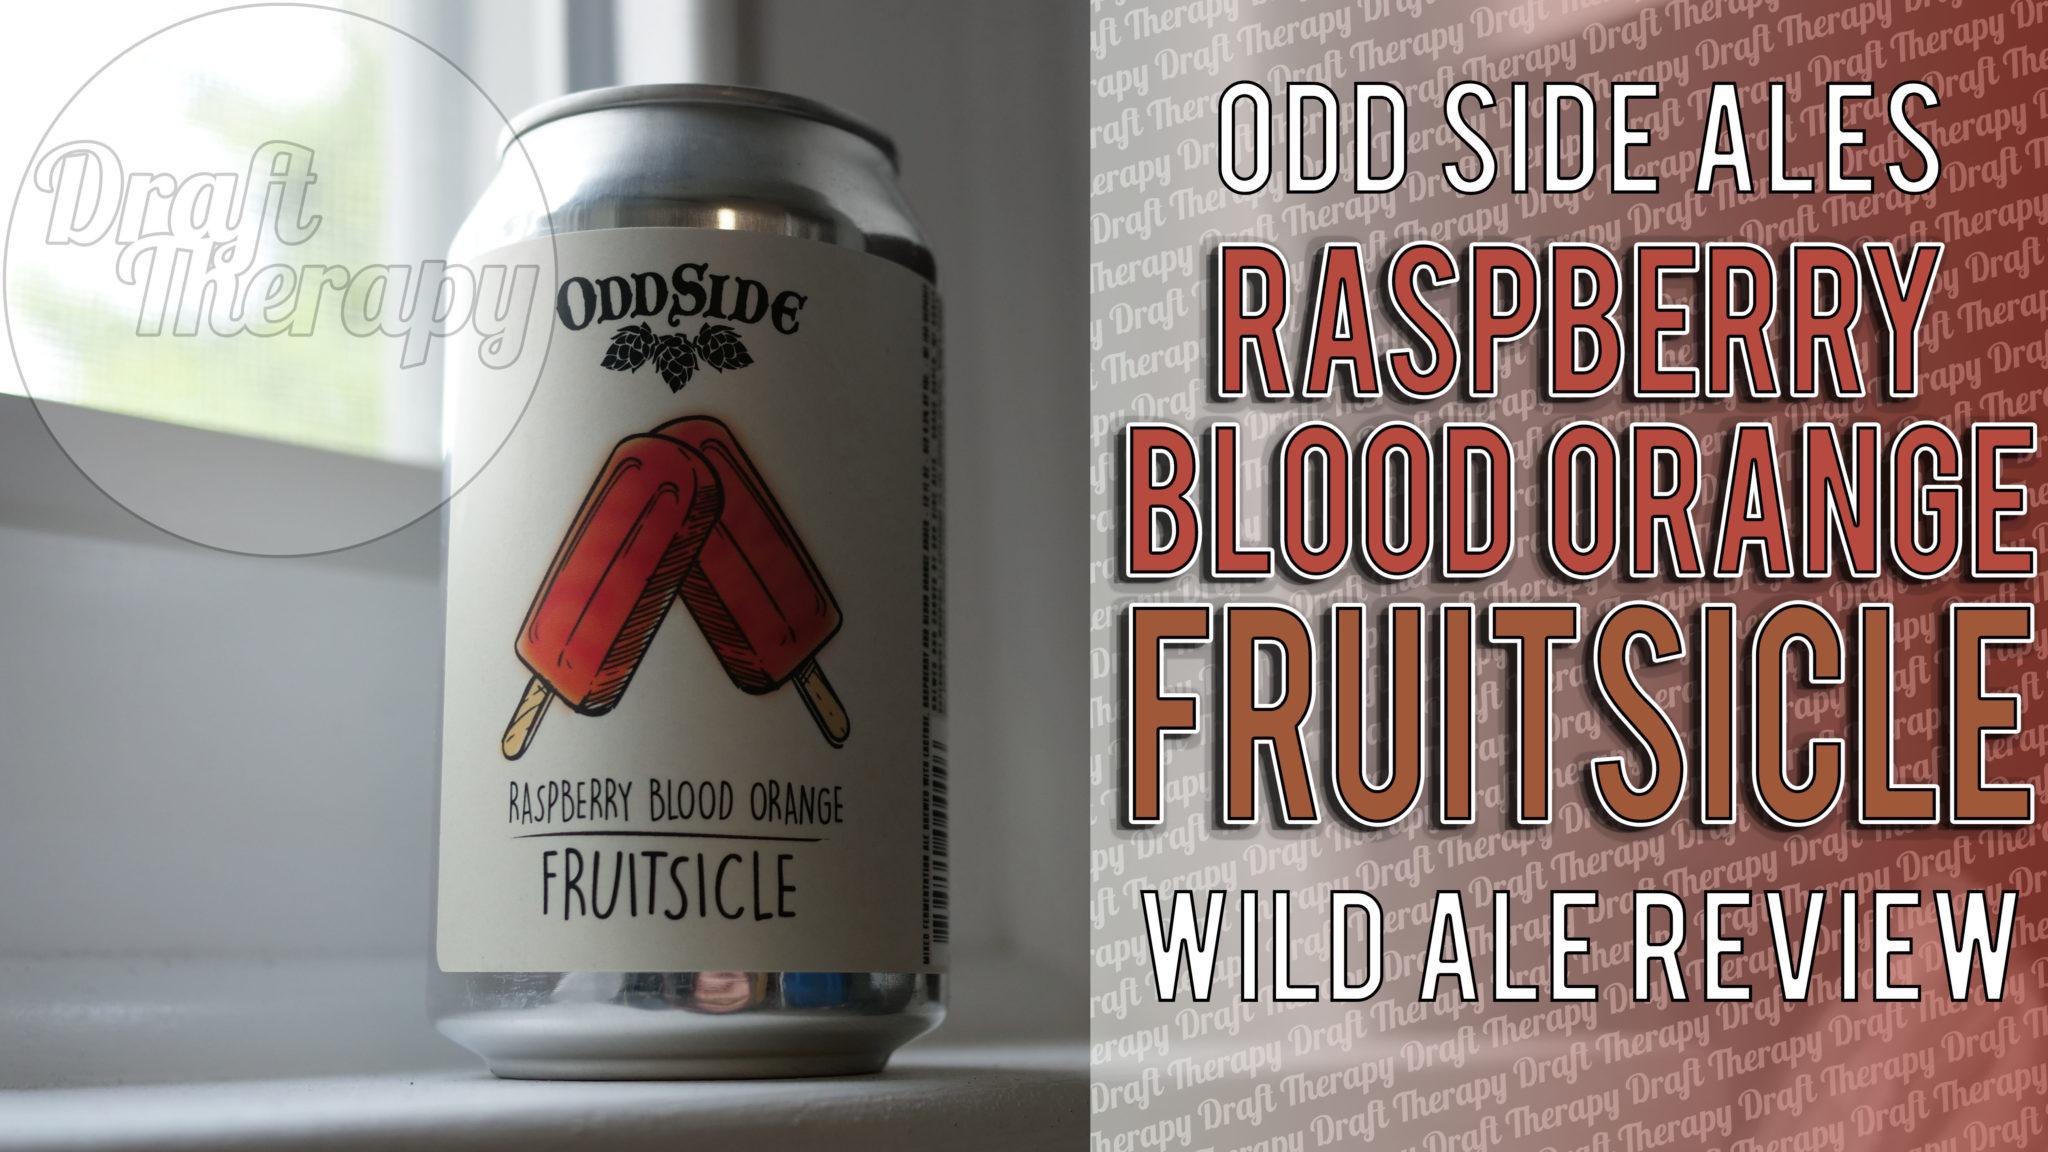 Odd Side Ales – Raspberry Blood Orange Fruitsicle!